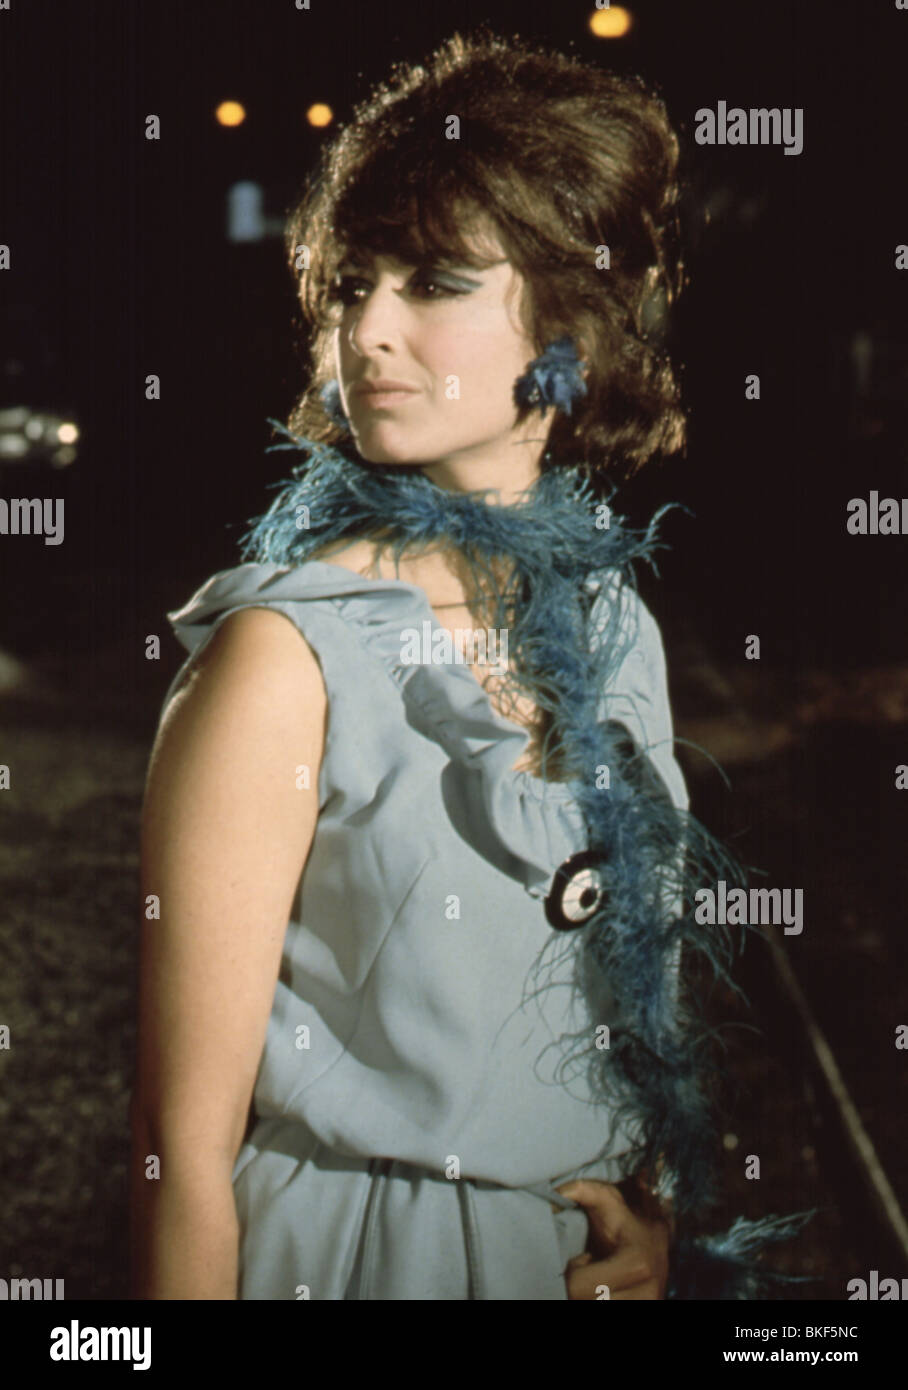 Bebe Neuwirth born December 31, 1958 (age 59),Melanie Hill Adult archive Margaret Livingston,Amy O'Neill